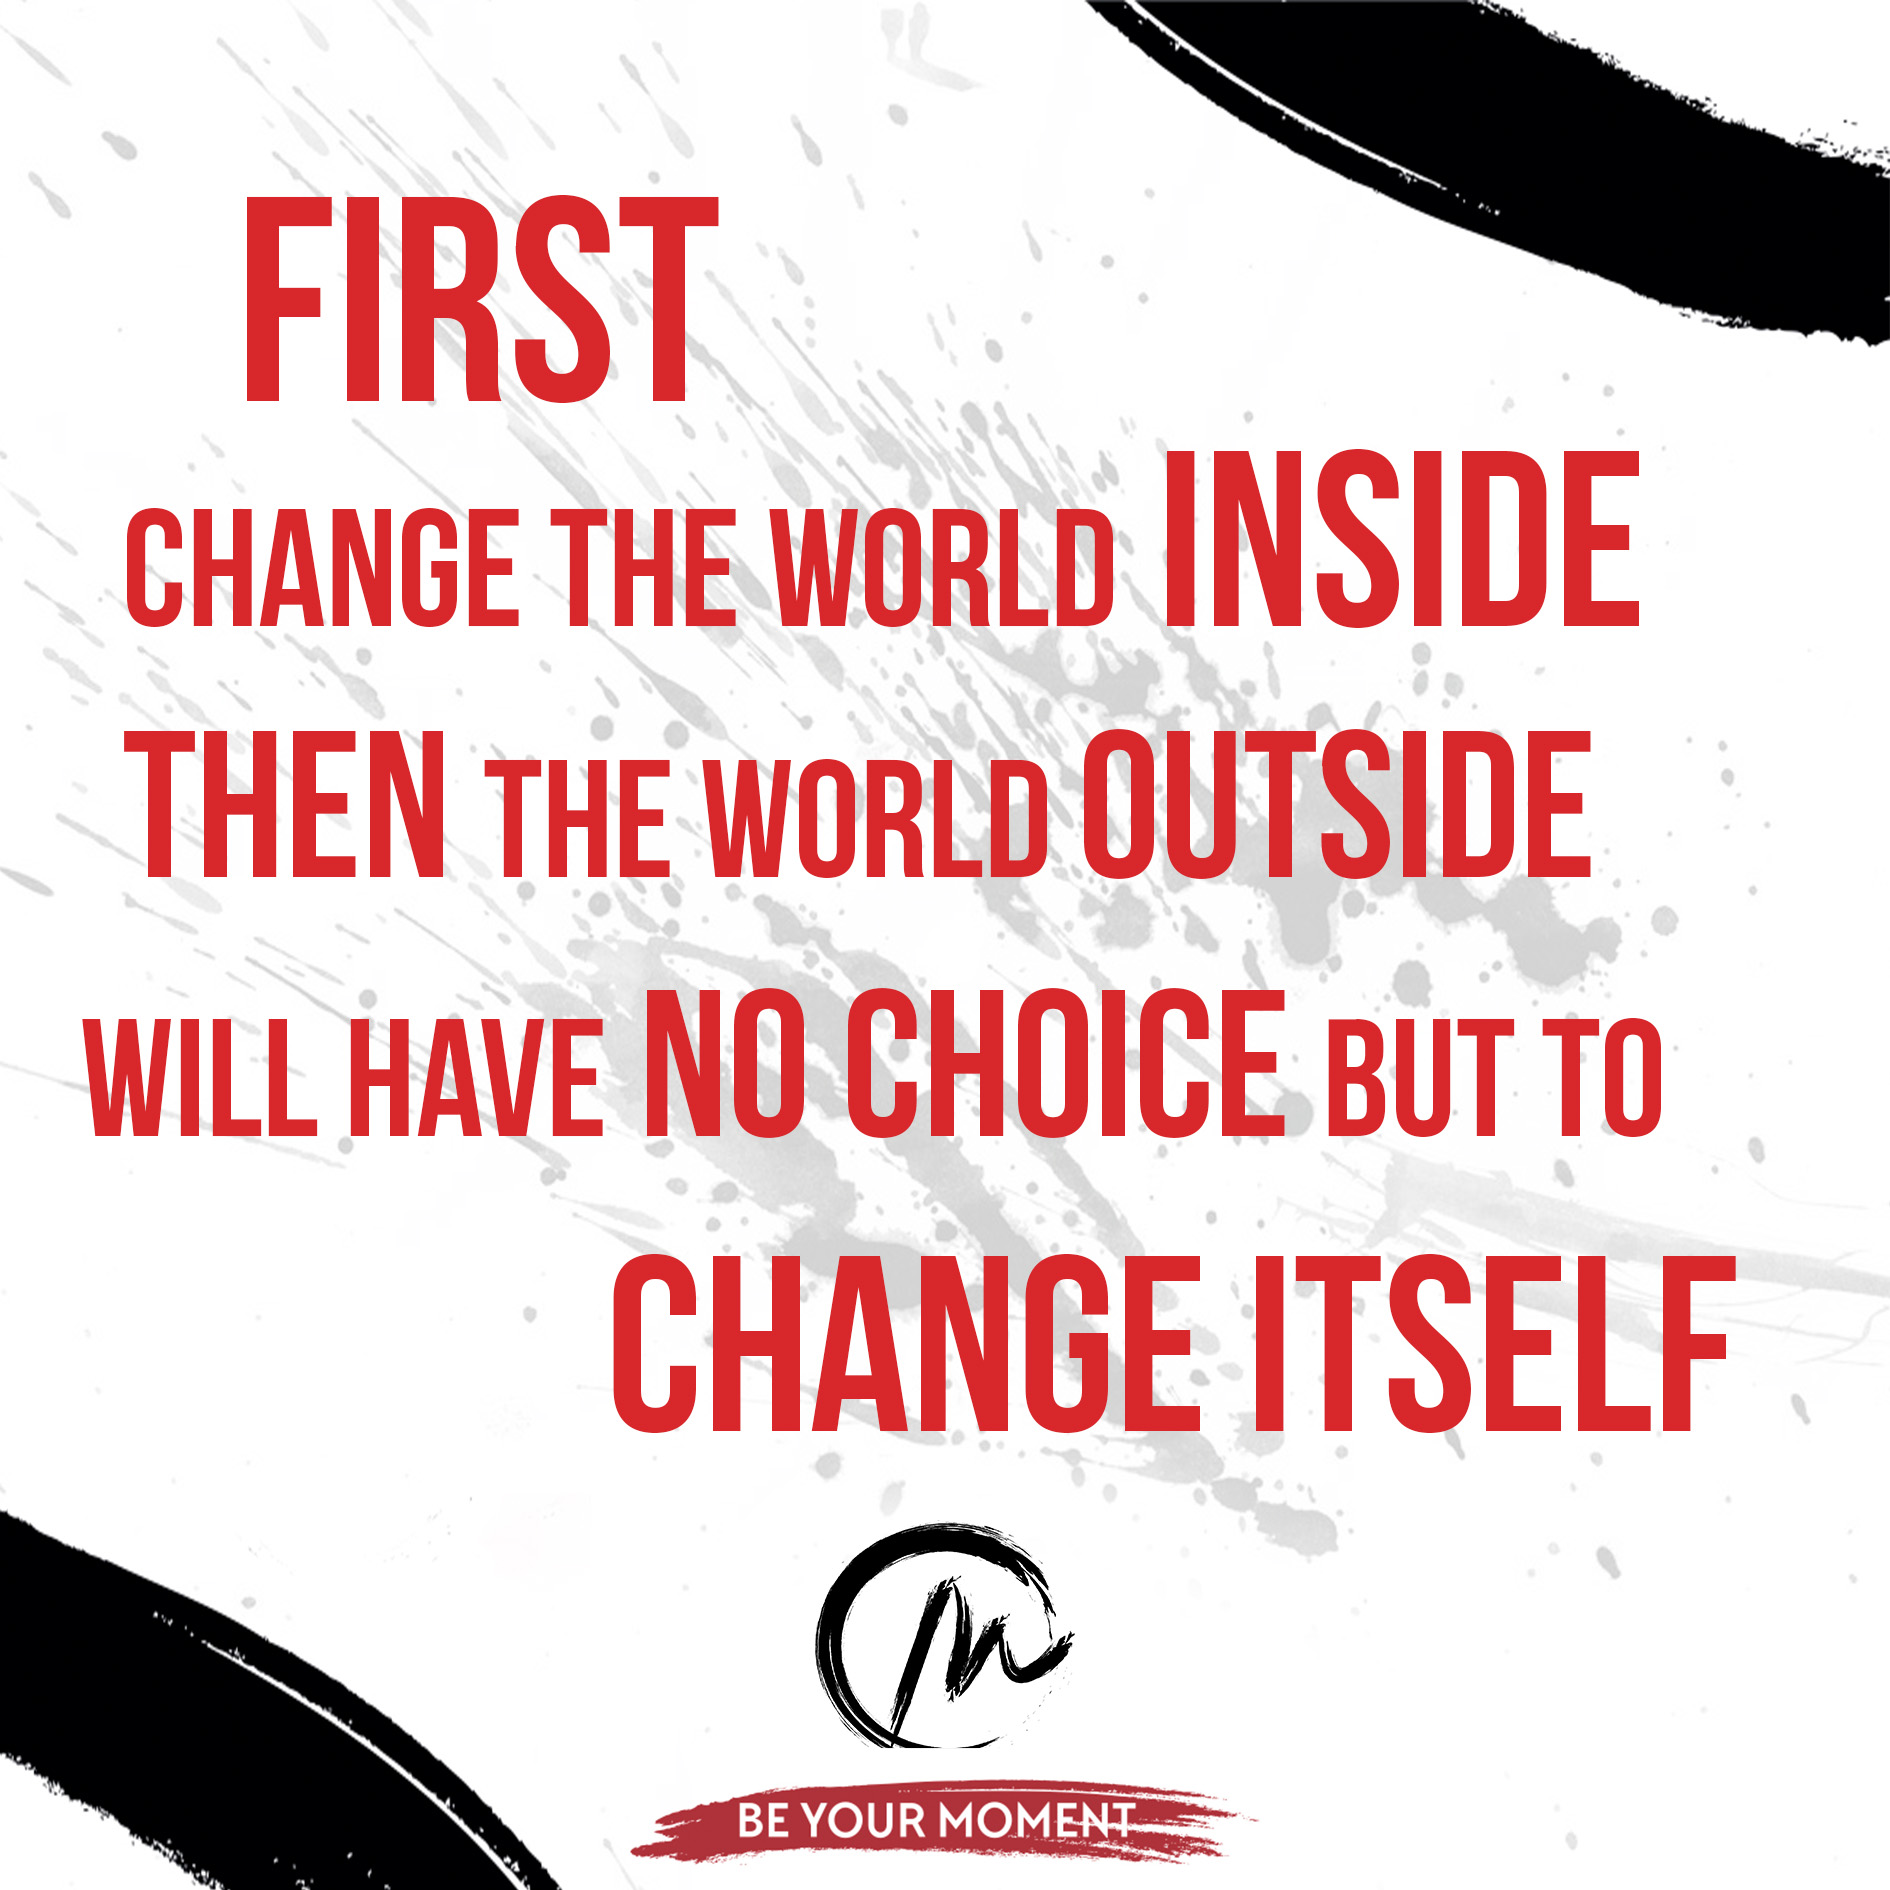 First Change The World Inside.jpeg